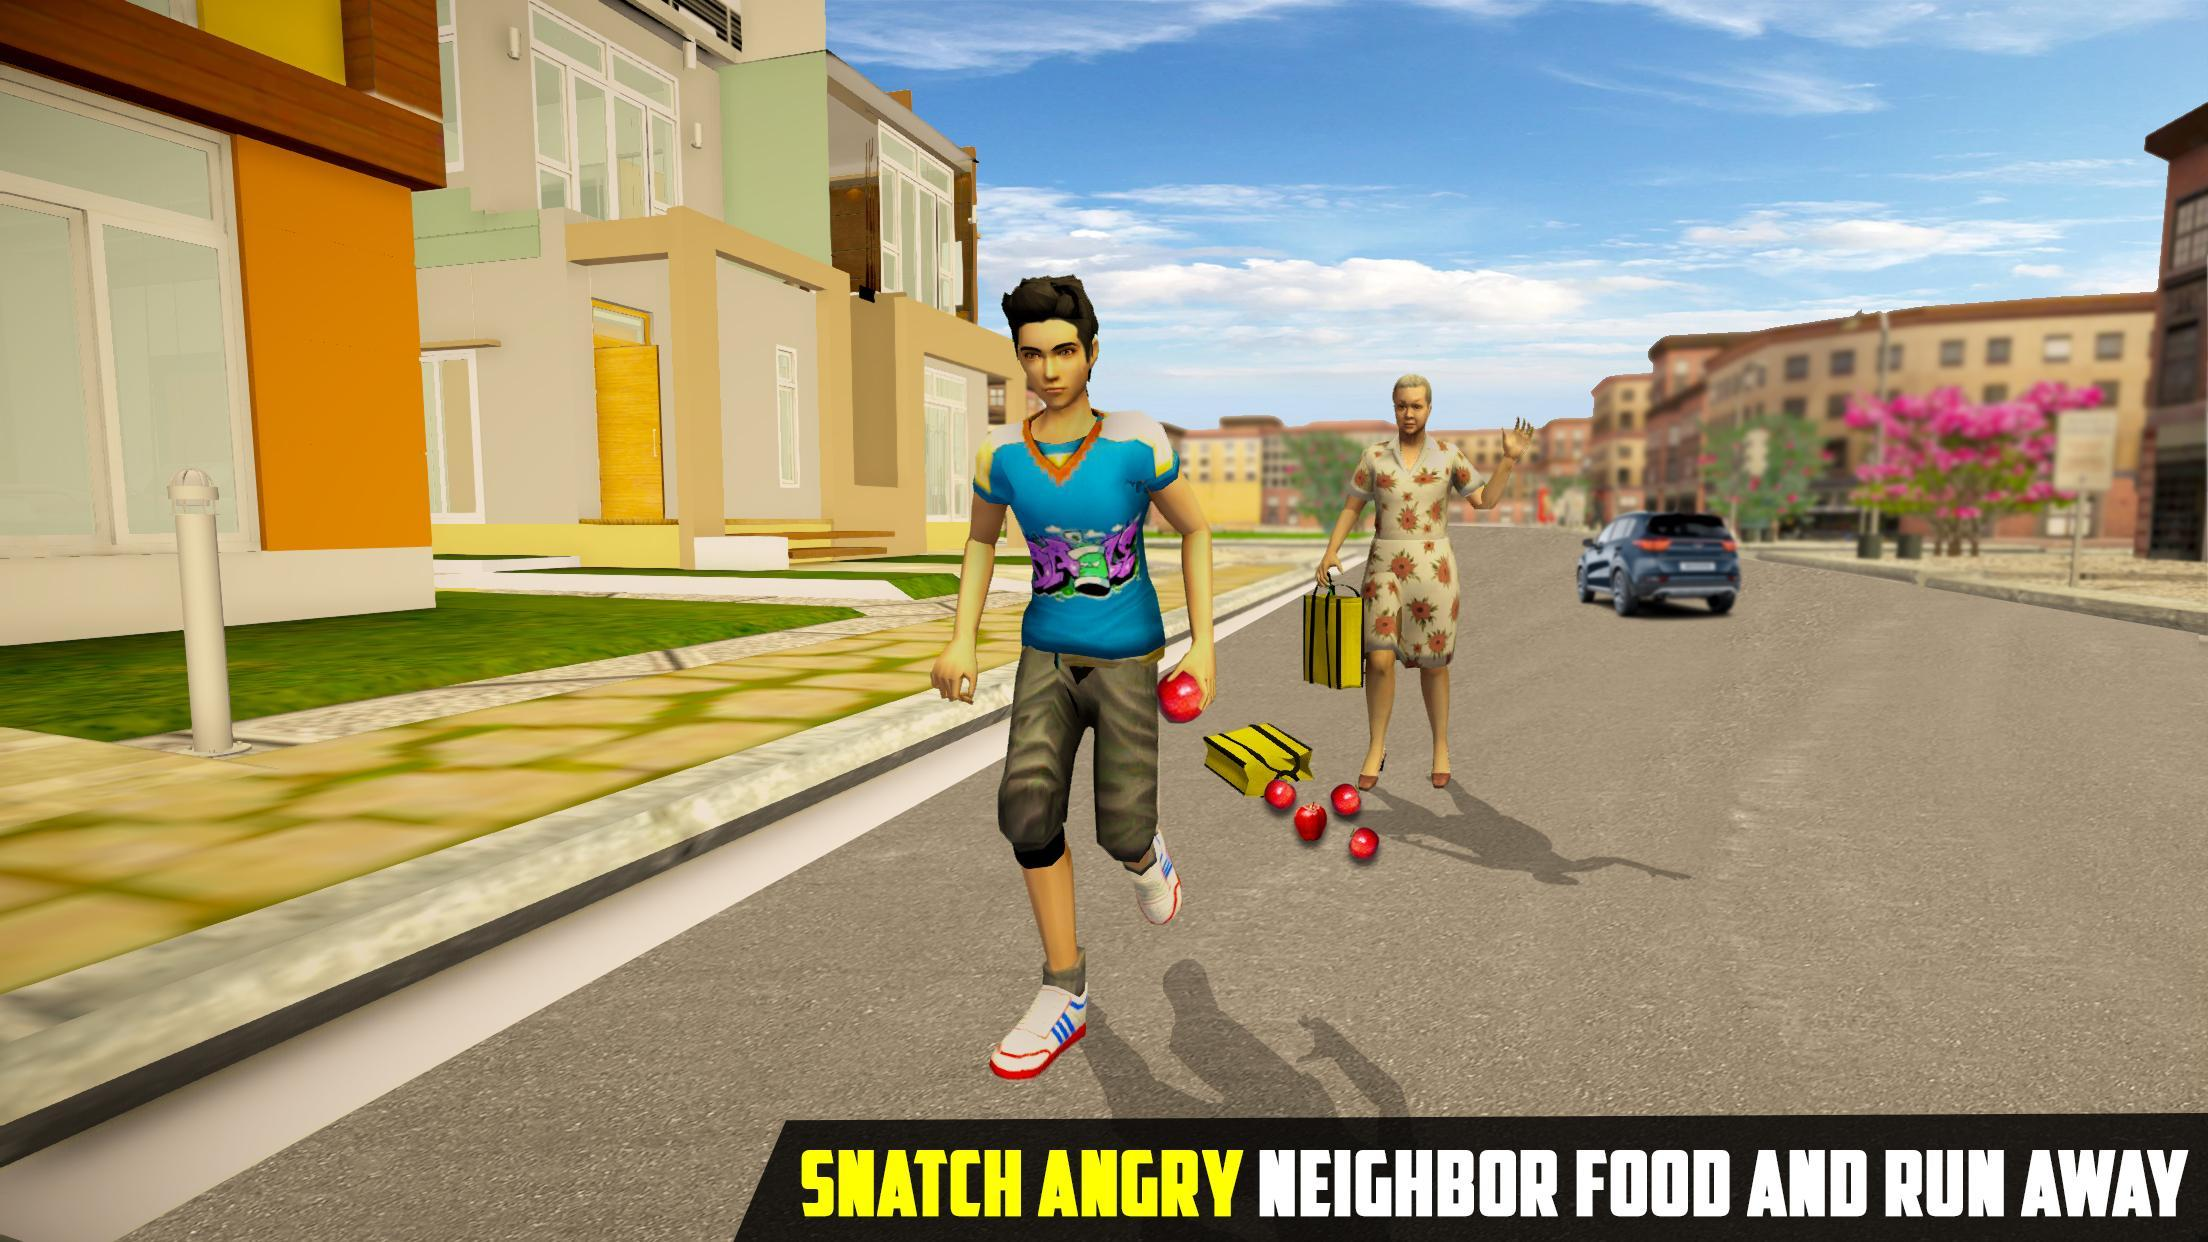 Virtual Bully Boys Next Angry Neighbor 1.4 Screenshot 15